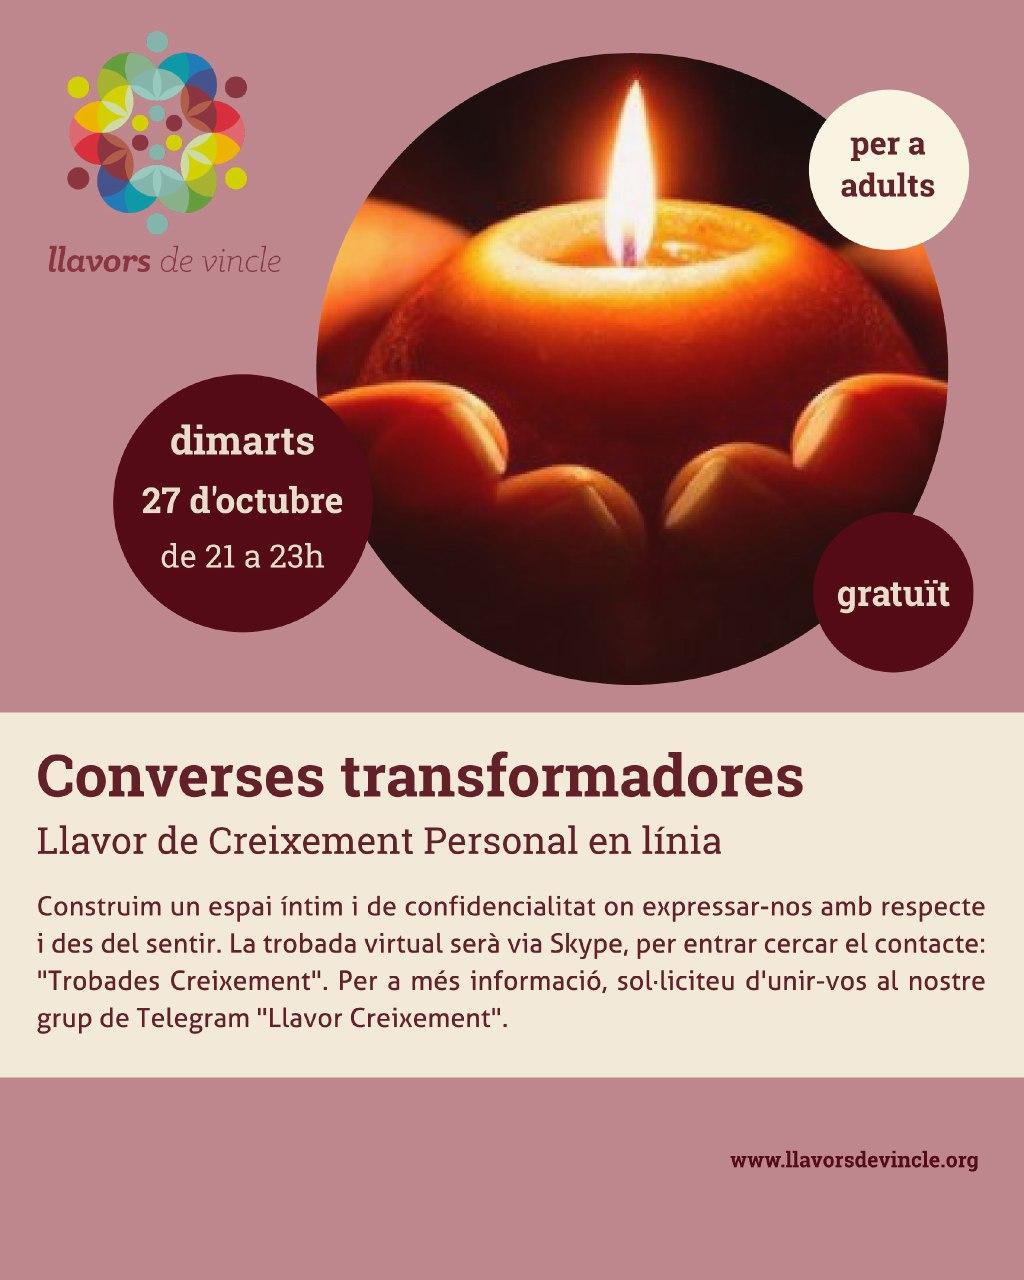 Converses transformadores (Skype)